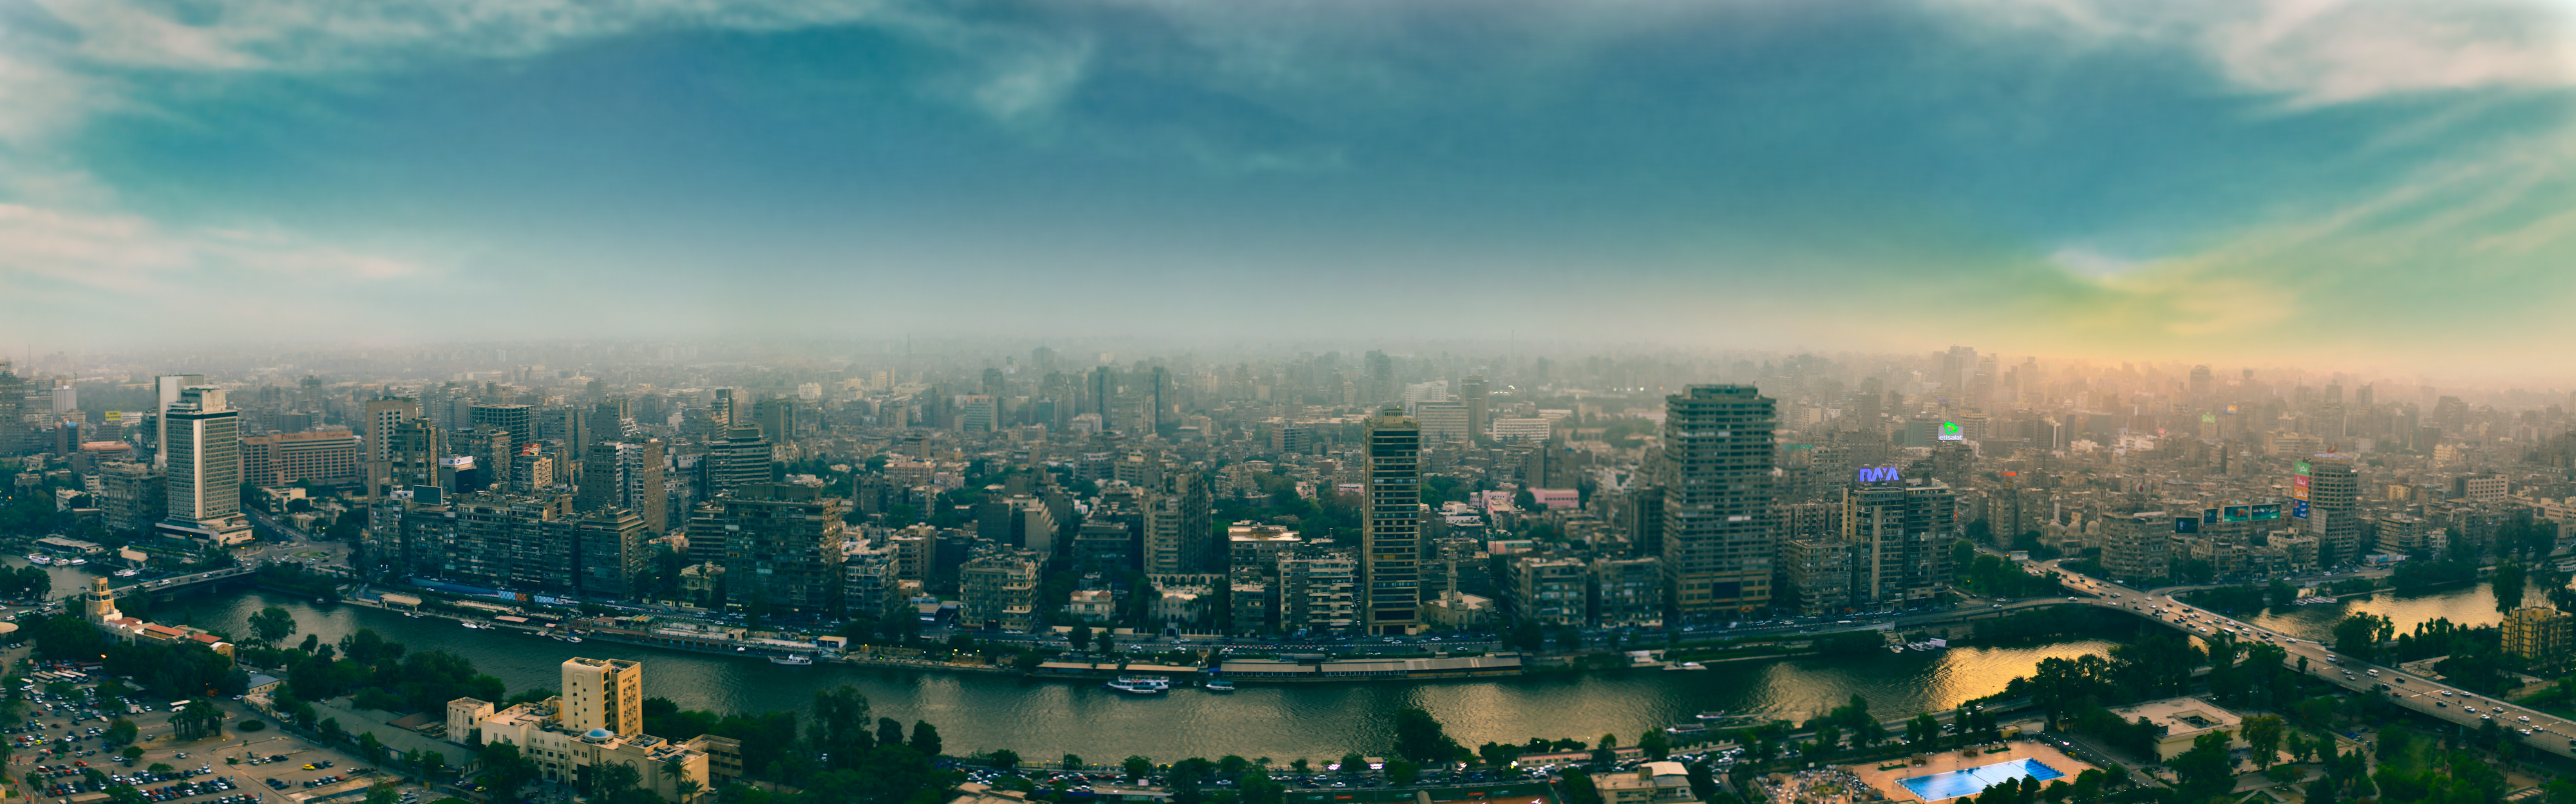 [X] République arabe d'Egypte - جمهورية مصر العربية Cairo_panorama